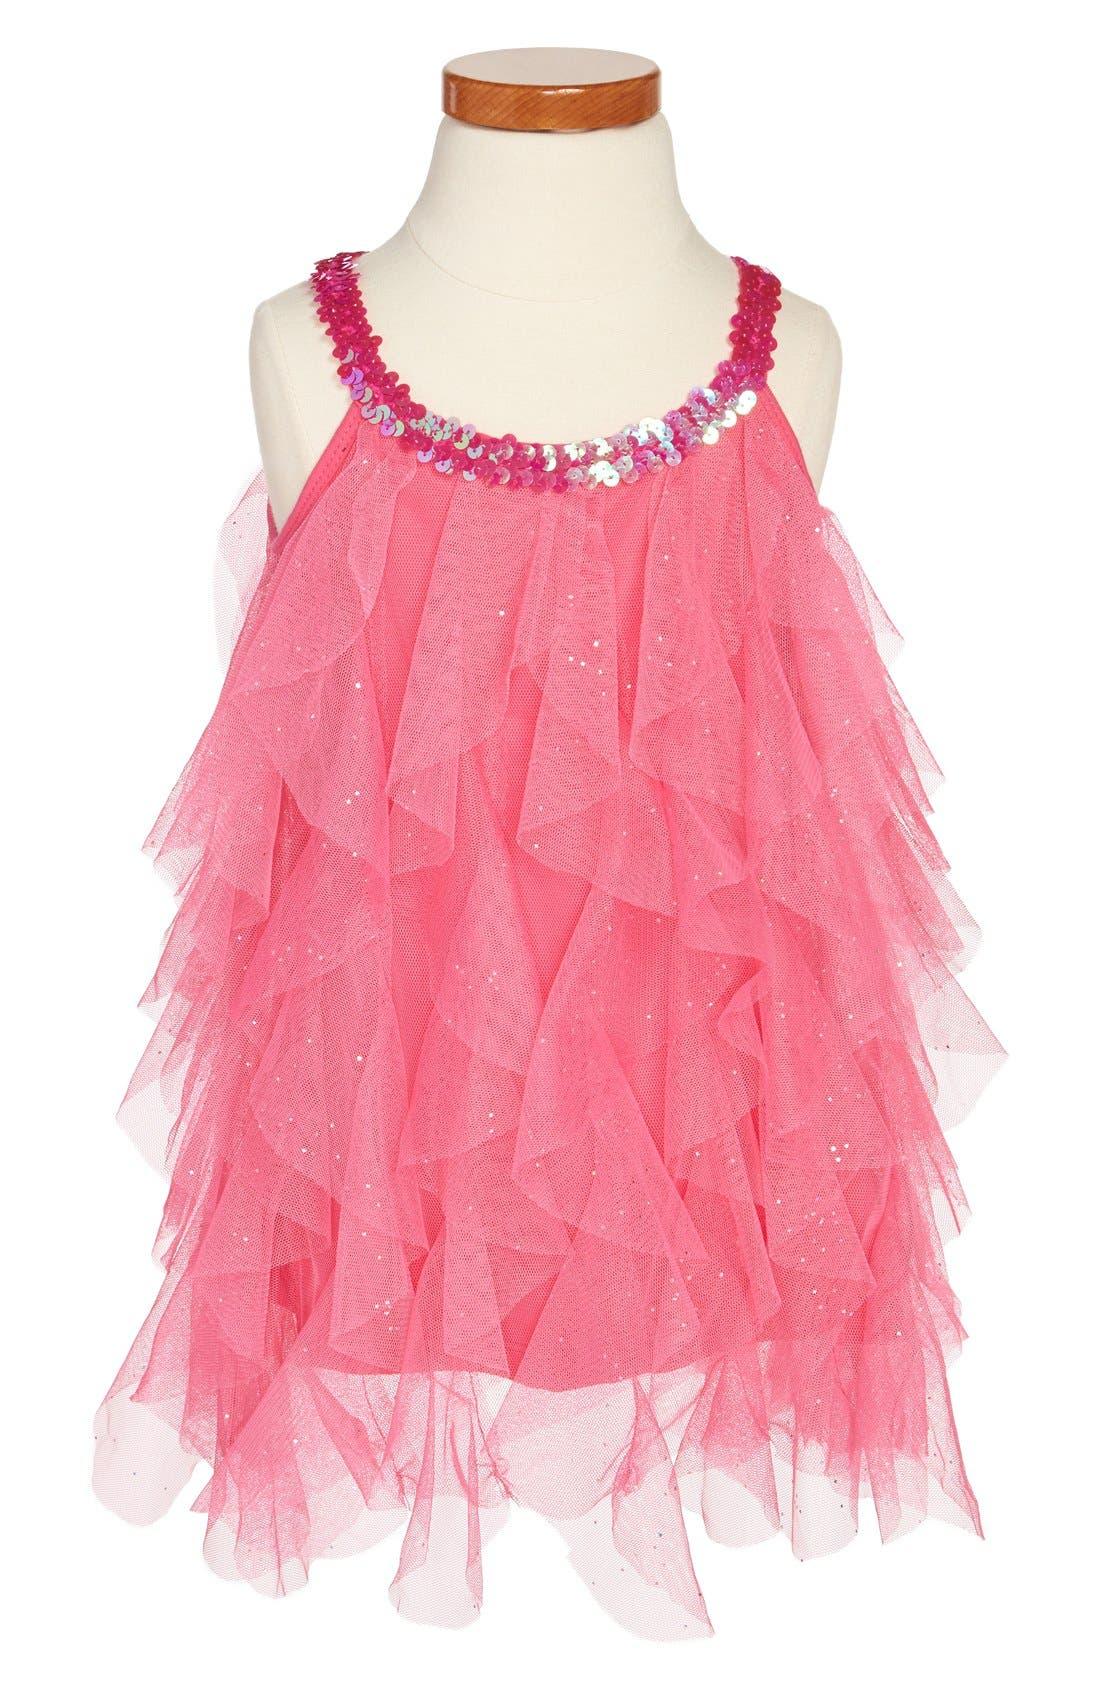 Alternate Image 1 Selected - Popatu 'Wave' Sequin Dress (Toddler Girls)